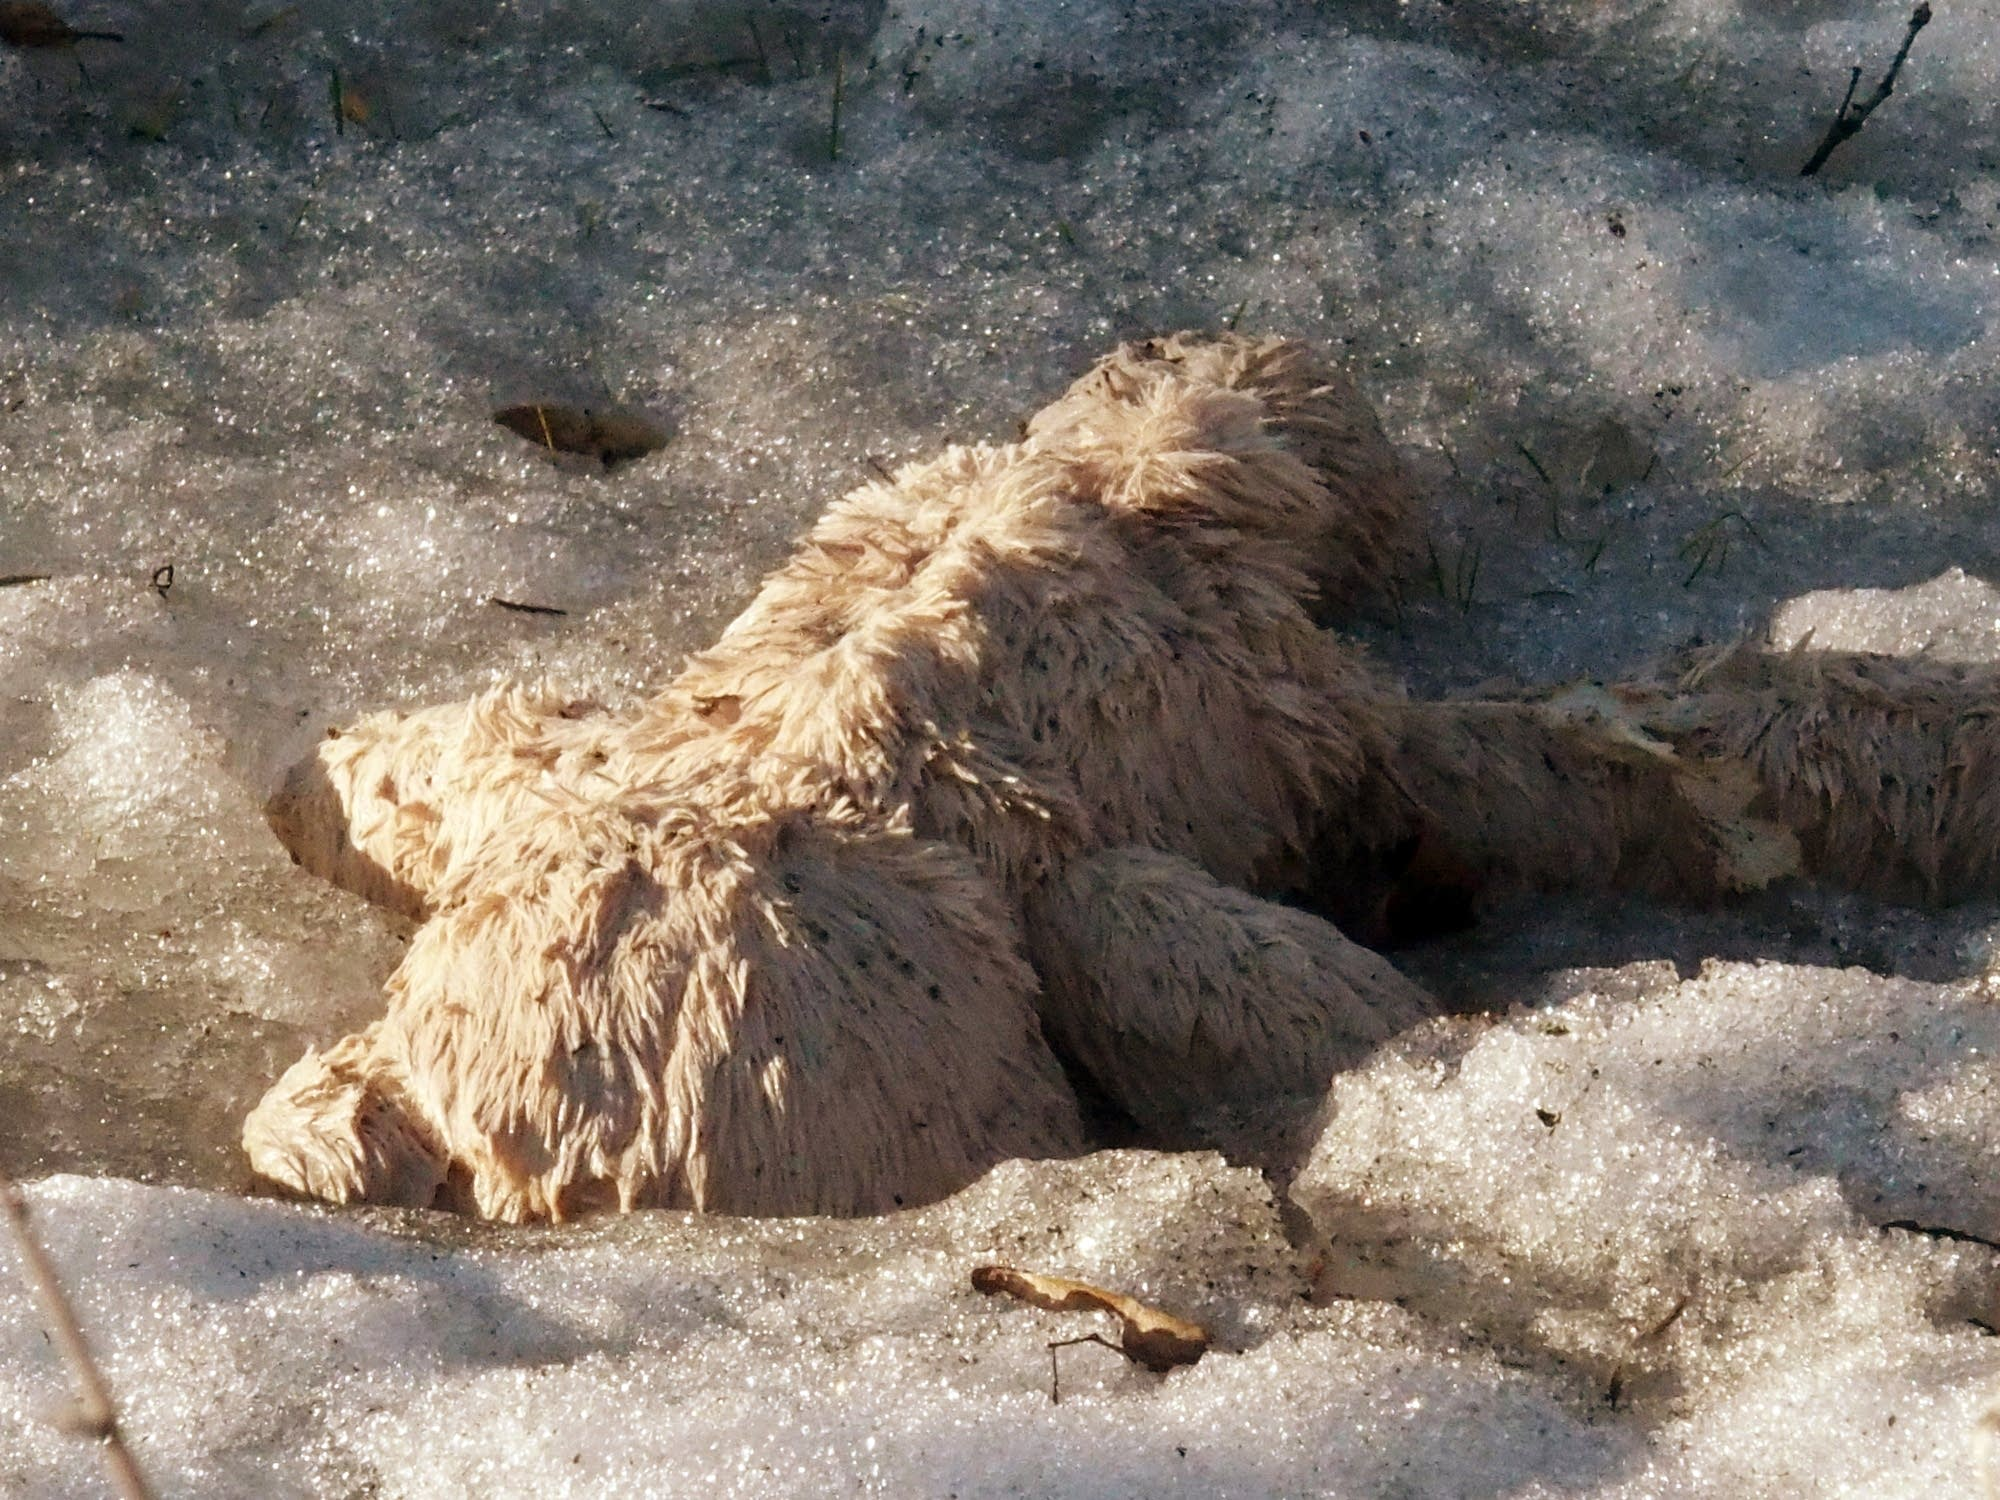 This forgotten teddy bear emerged from a snow drift.